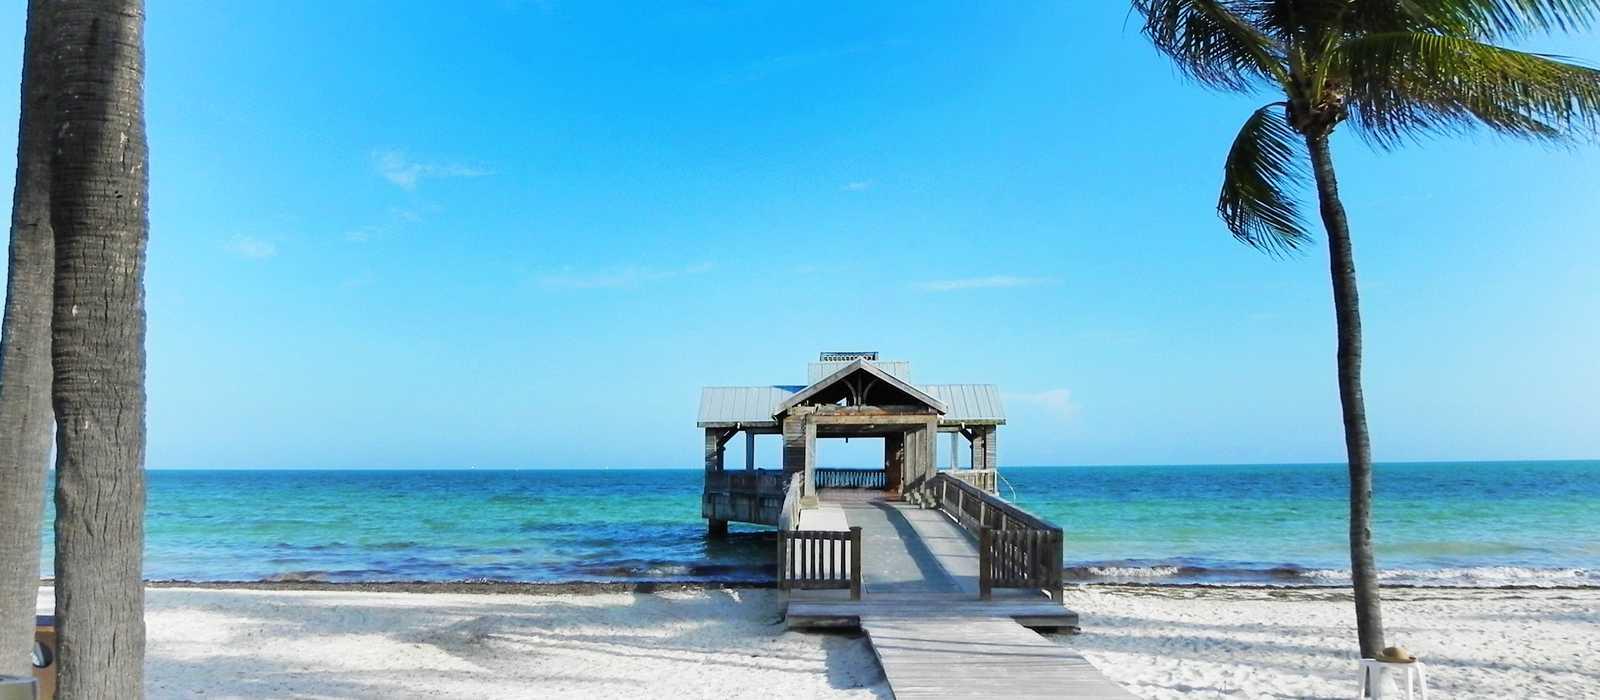 Brücke am Strand auf Key West, Florida